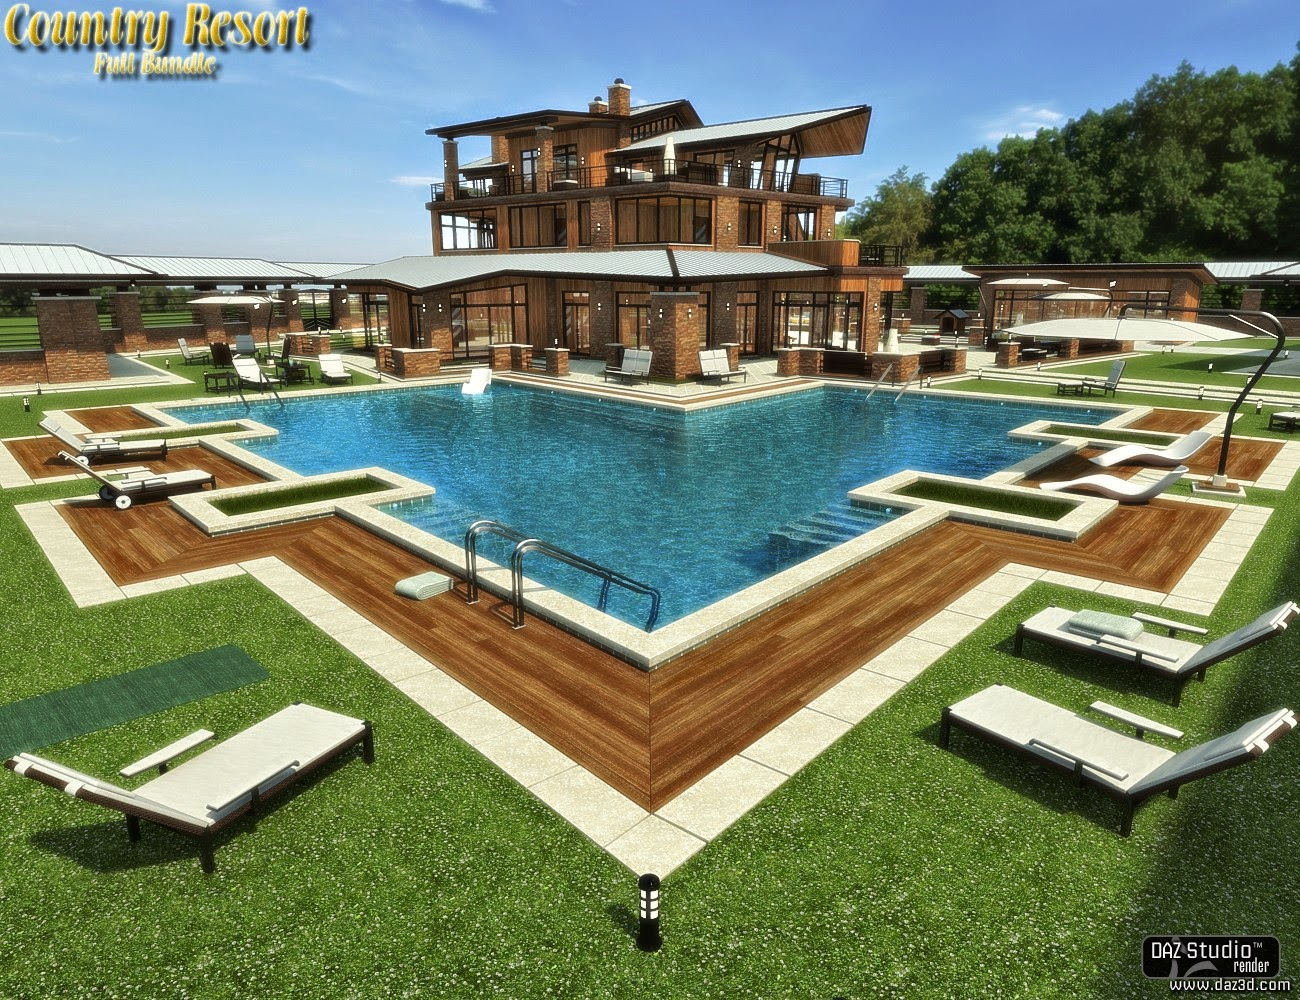 3d Models - Country Resort - Bundle